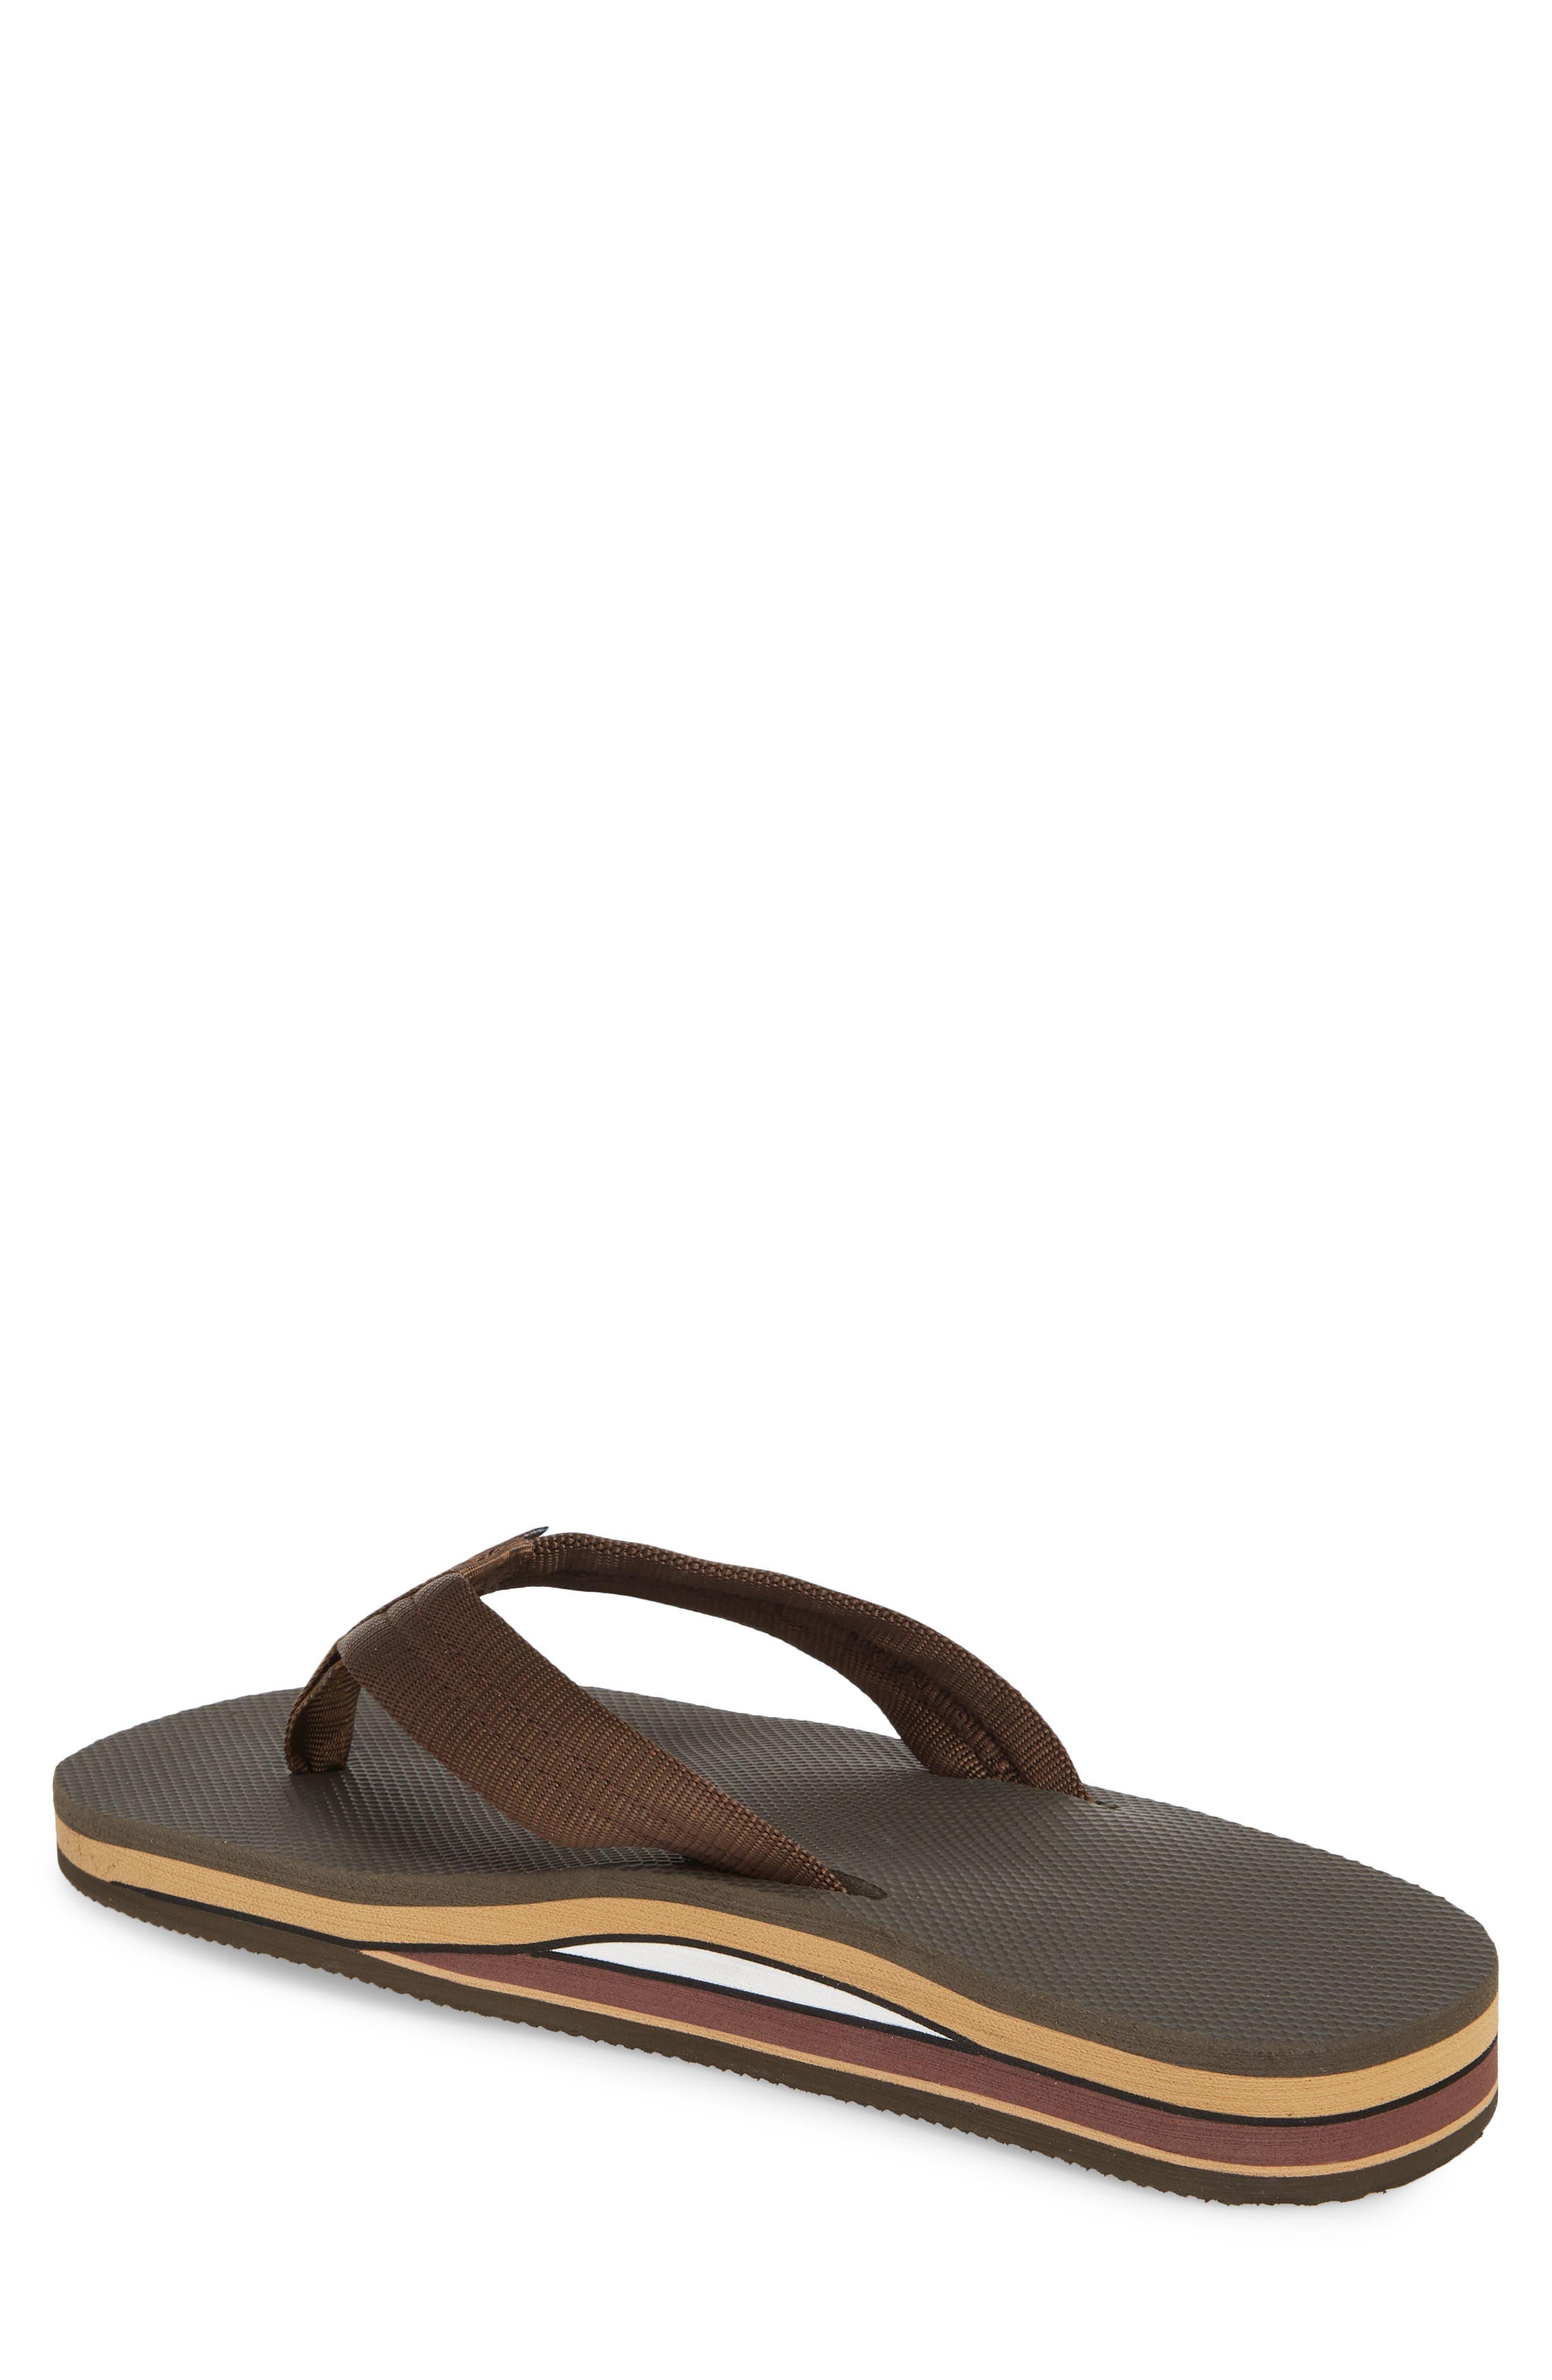 04af9a9eb2e2 Rainbow Sandals   Flip-Flops